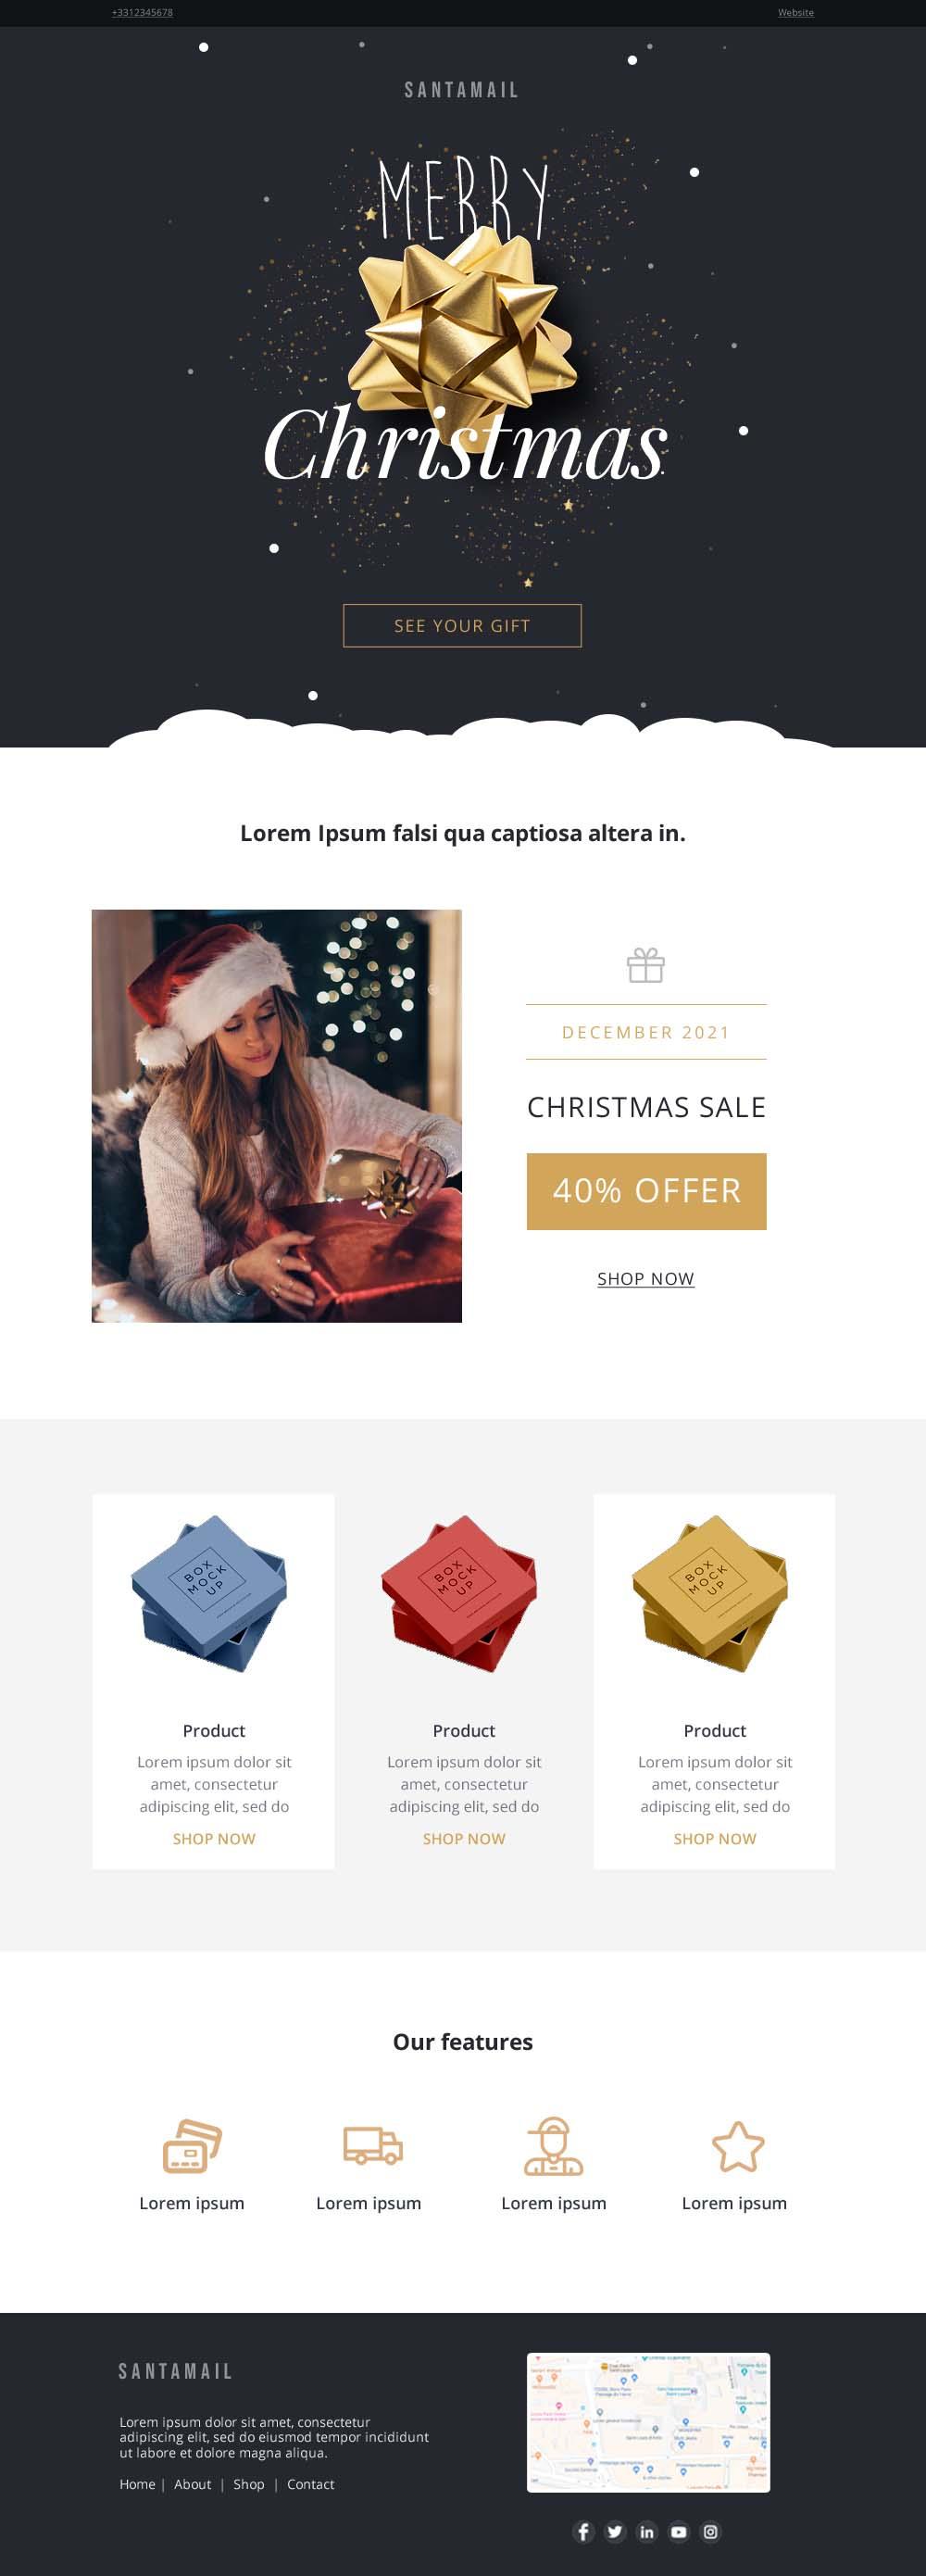 Templates Emailing SantaGift Sarbacane